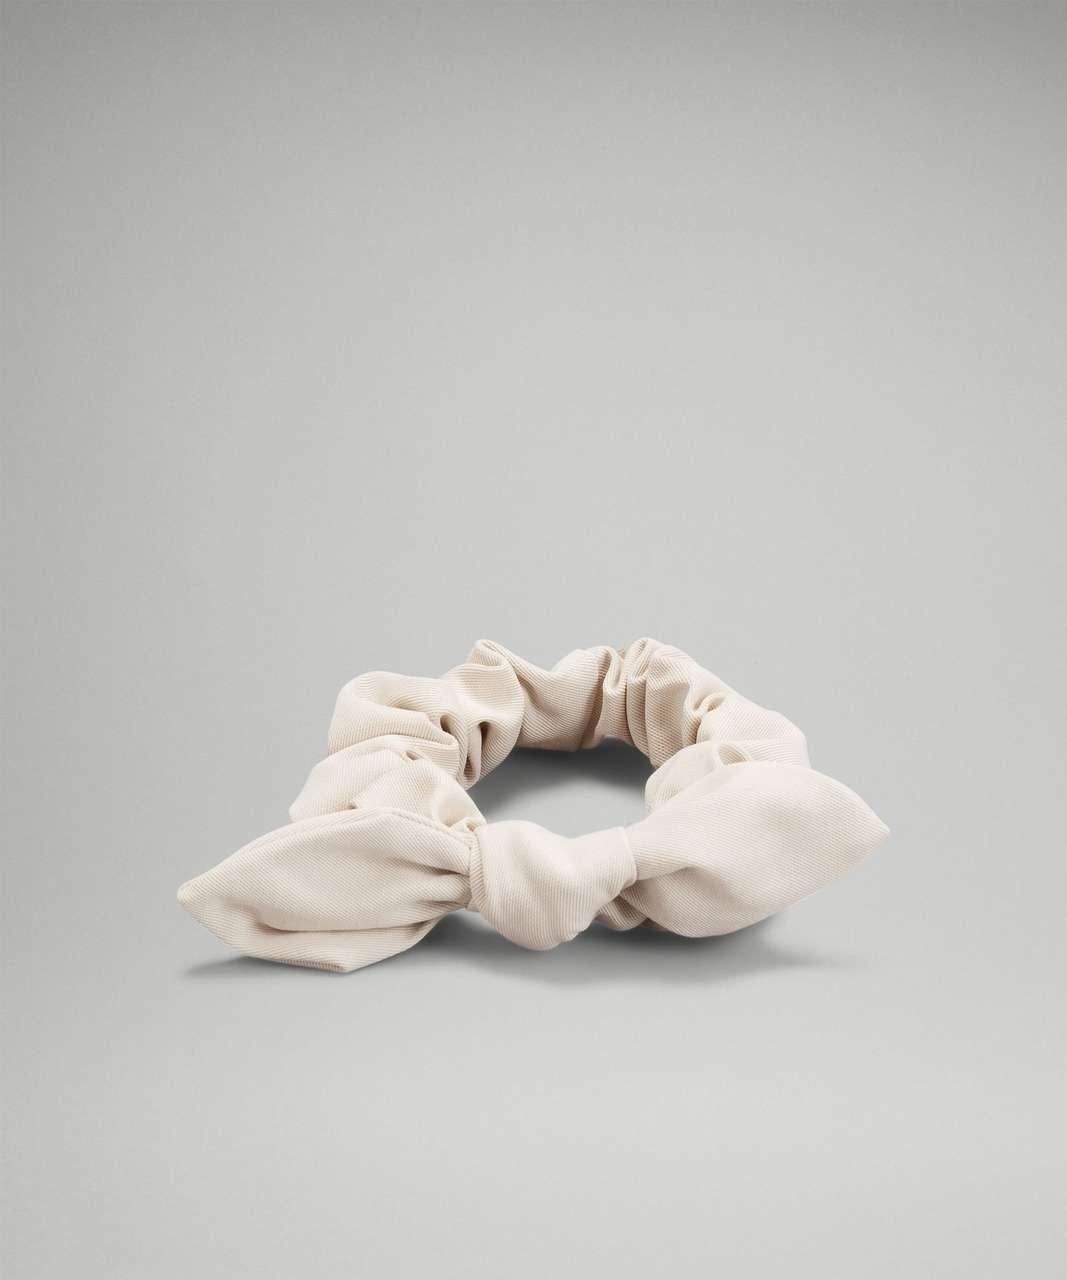 Lululemon Uplifting Scrunchie Bow *Twill Fabric - White Opal